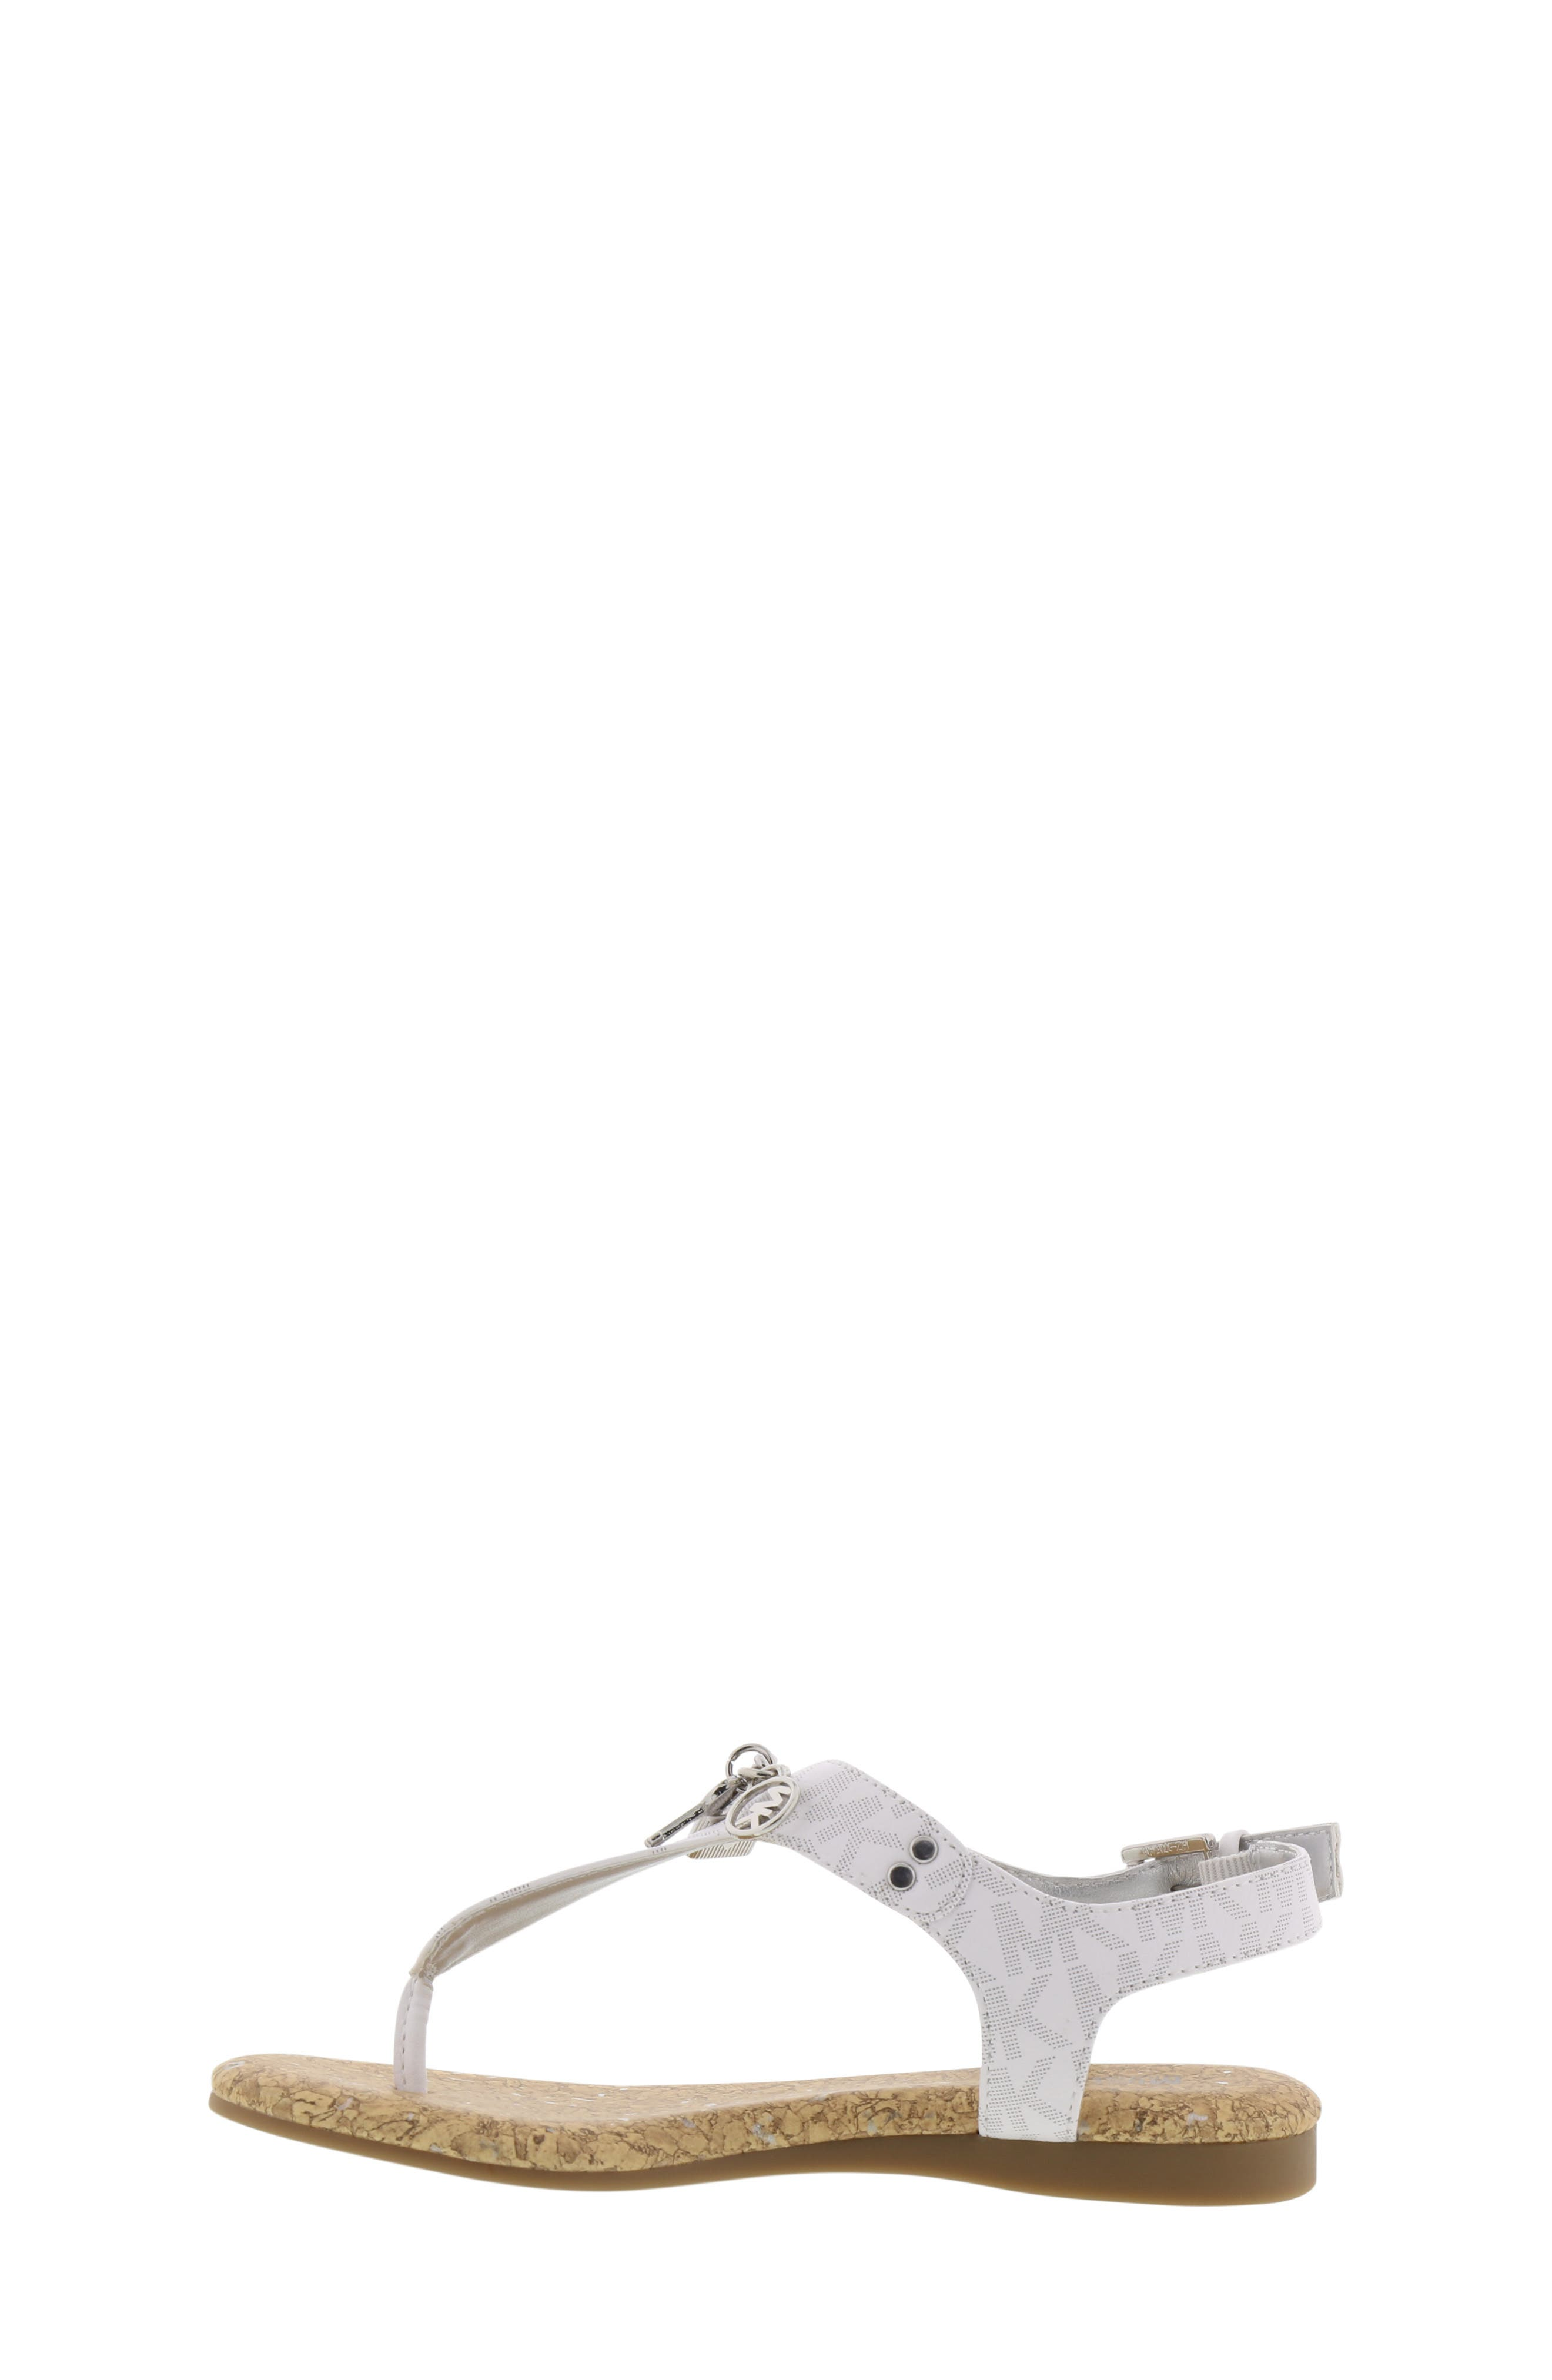 MICHAEL MICHAEL KORS, Tilly Cora Charm T-Strap Sandal, Alternate thumbnail 8, color, WHITE LOGO